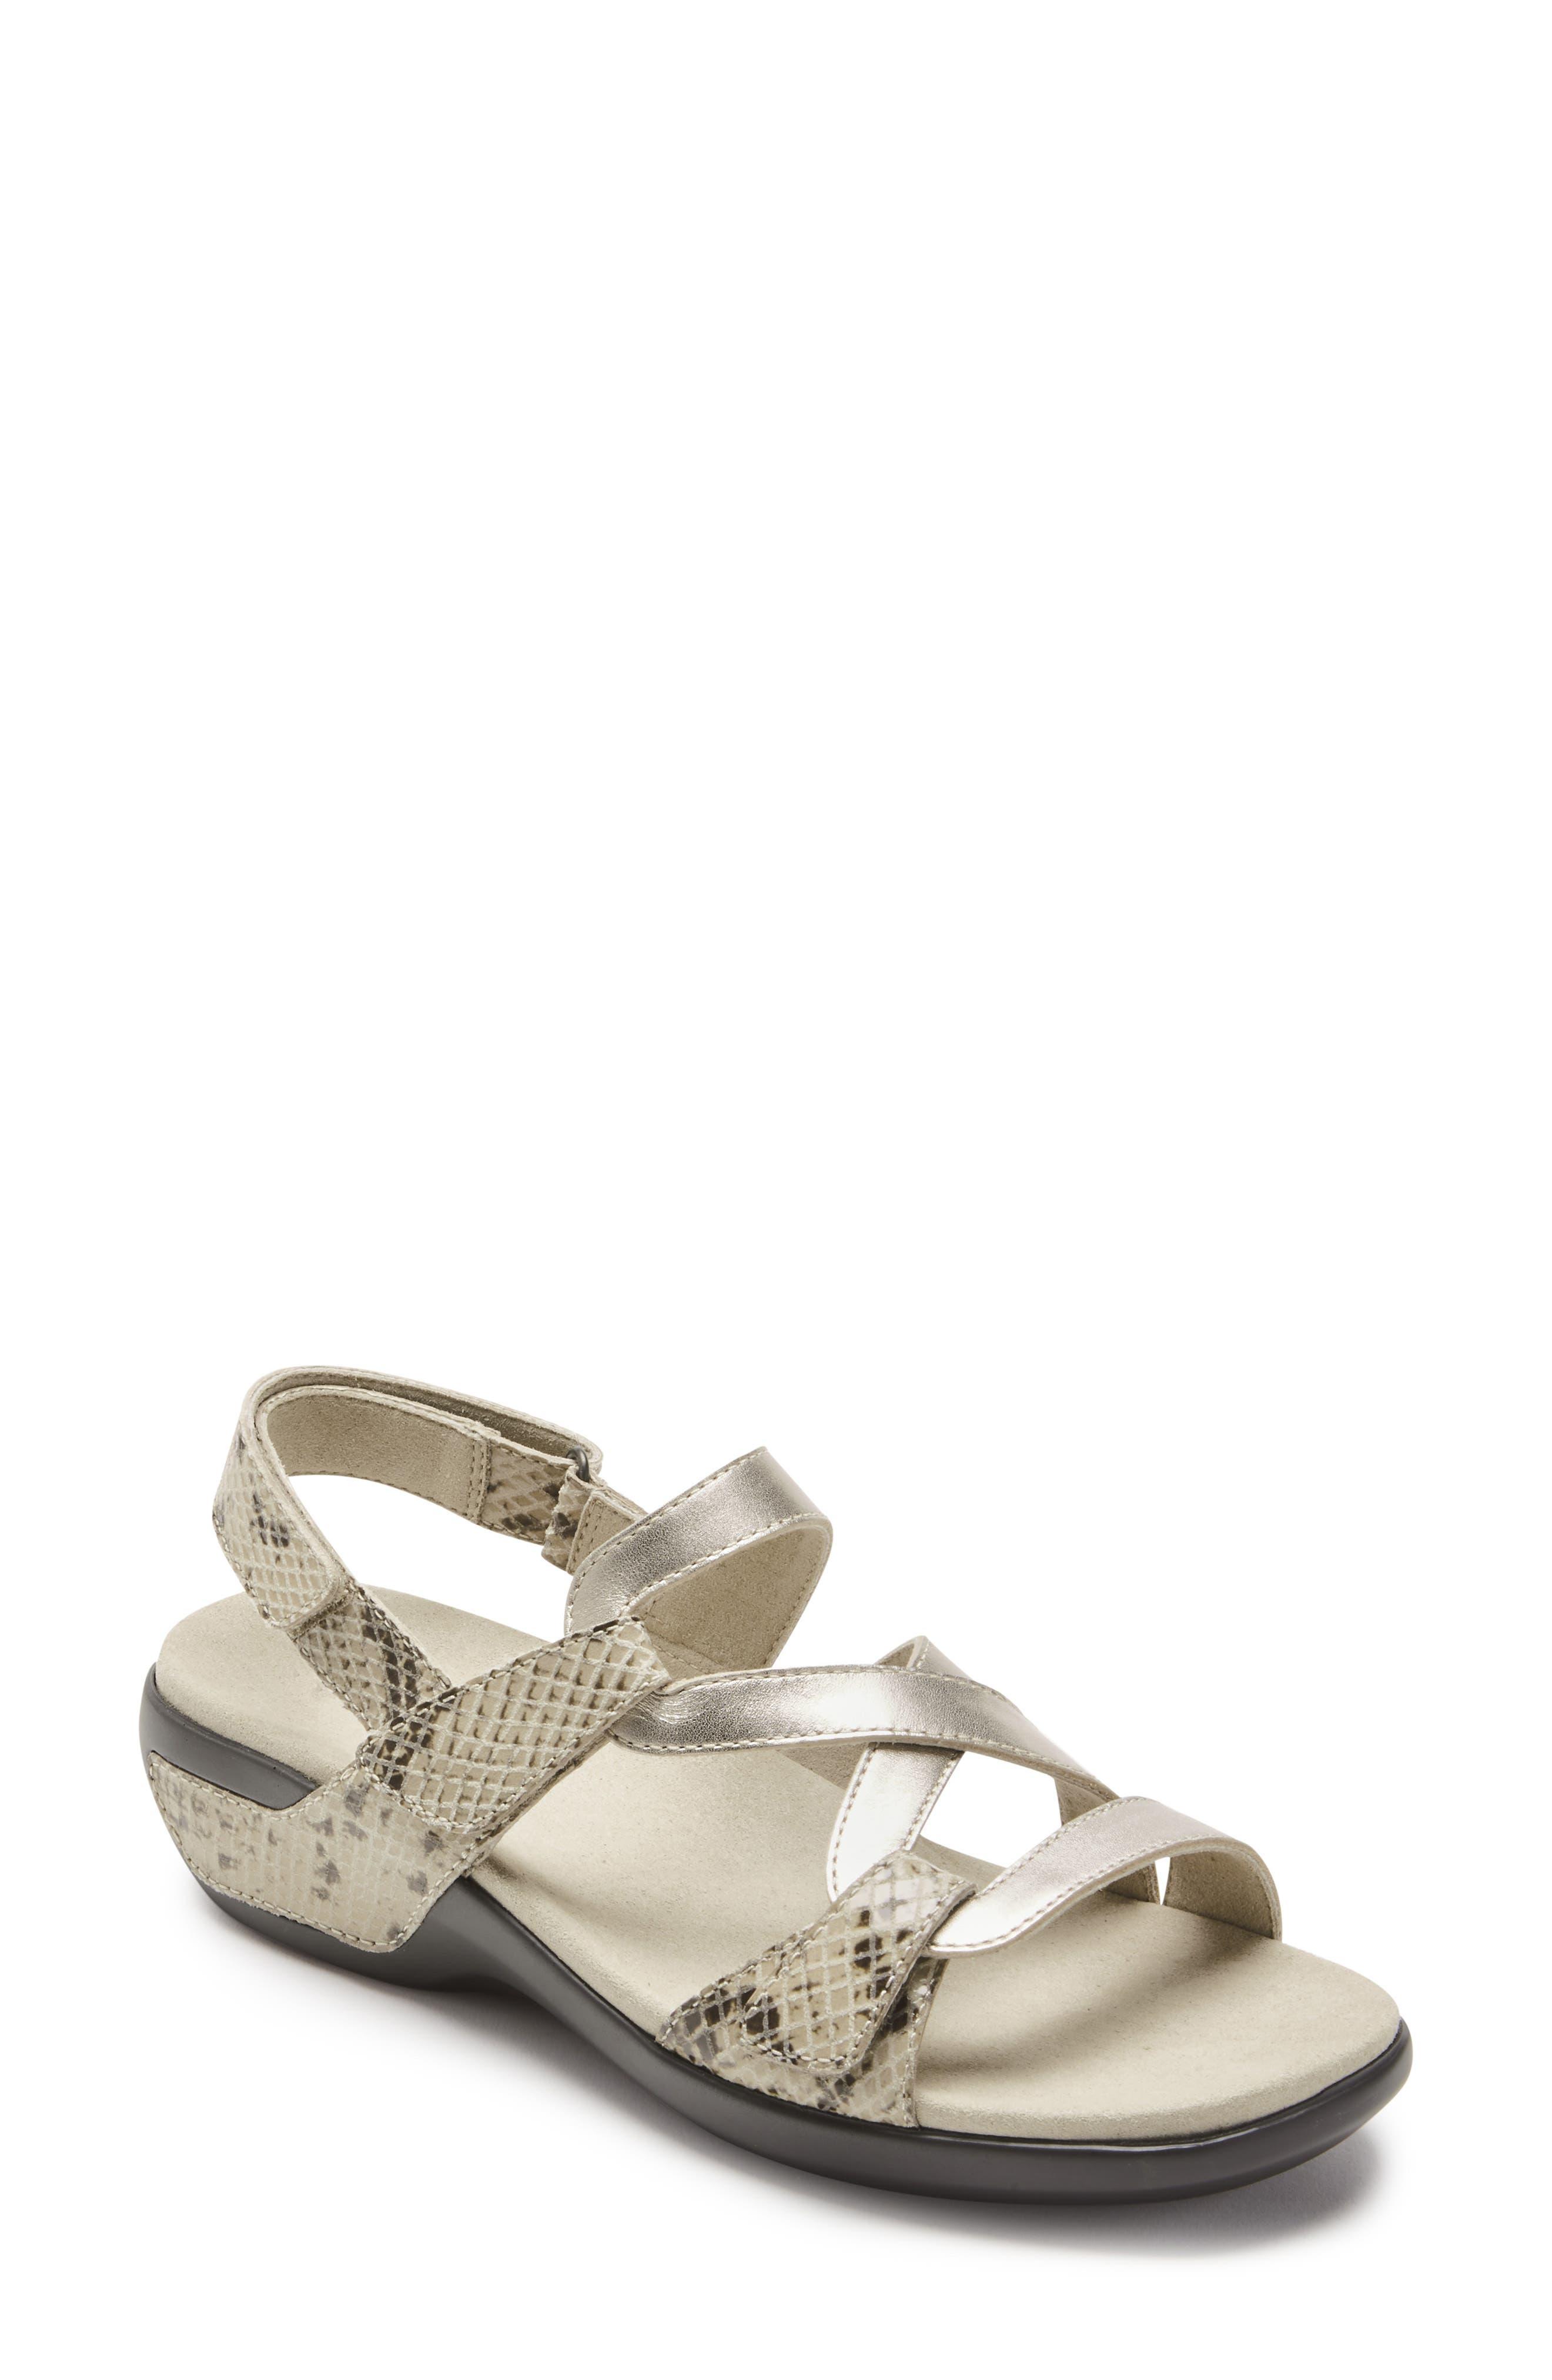 Power Comfort Curvy Strap Sandal